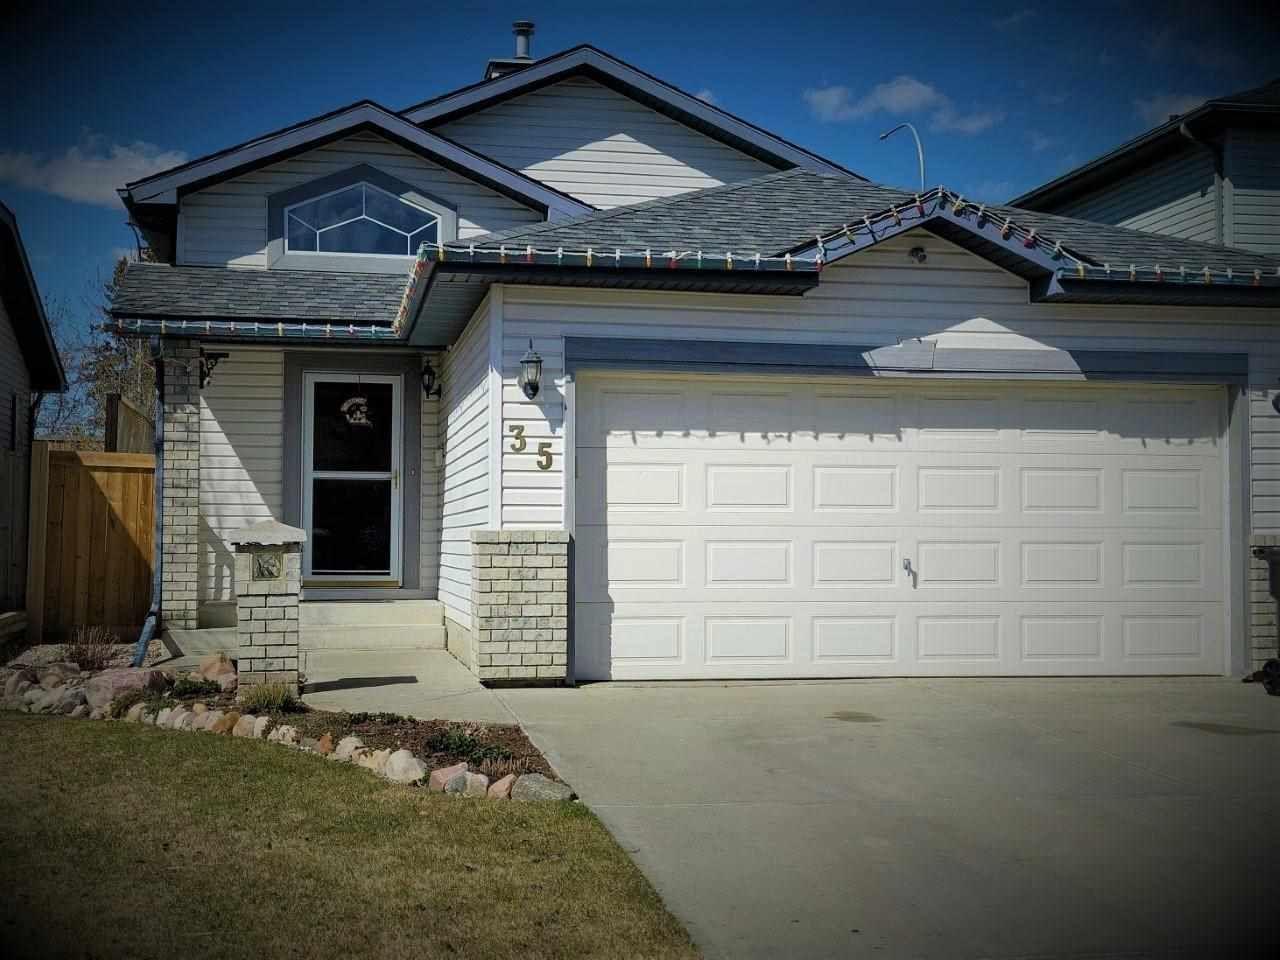 Main Photo: 35 LANDSDOWNE Drive: Spruce Grove House for sale : MLS®# E4241540